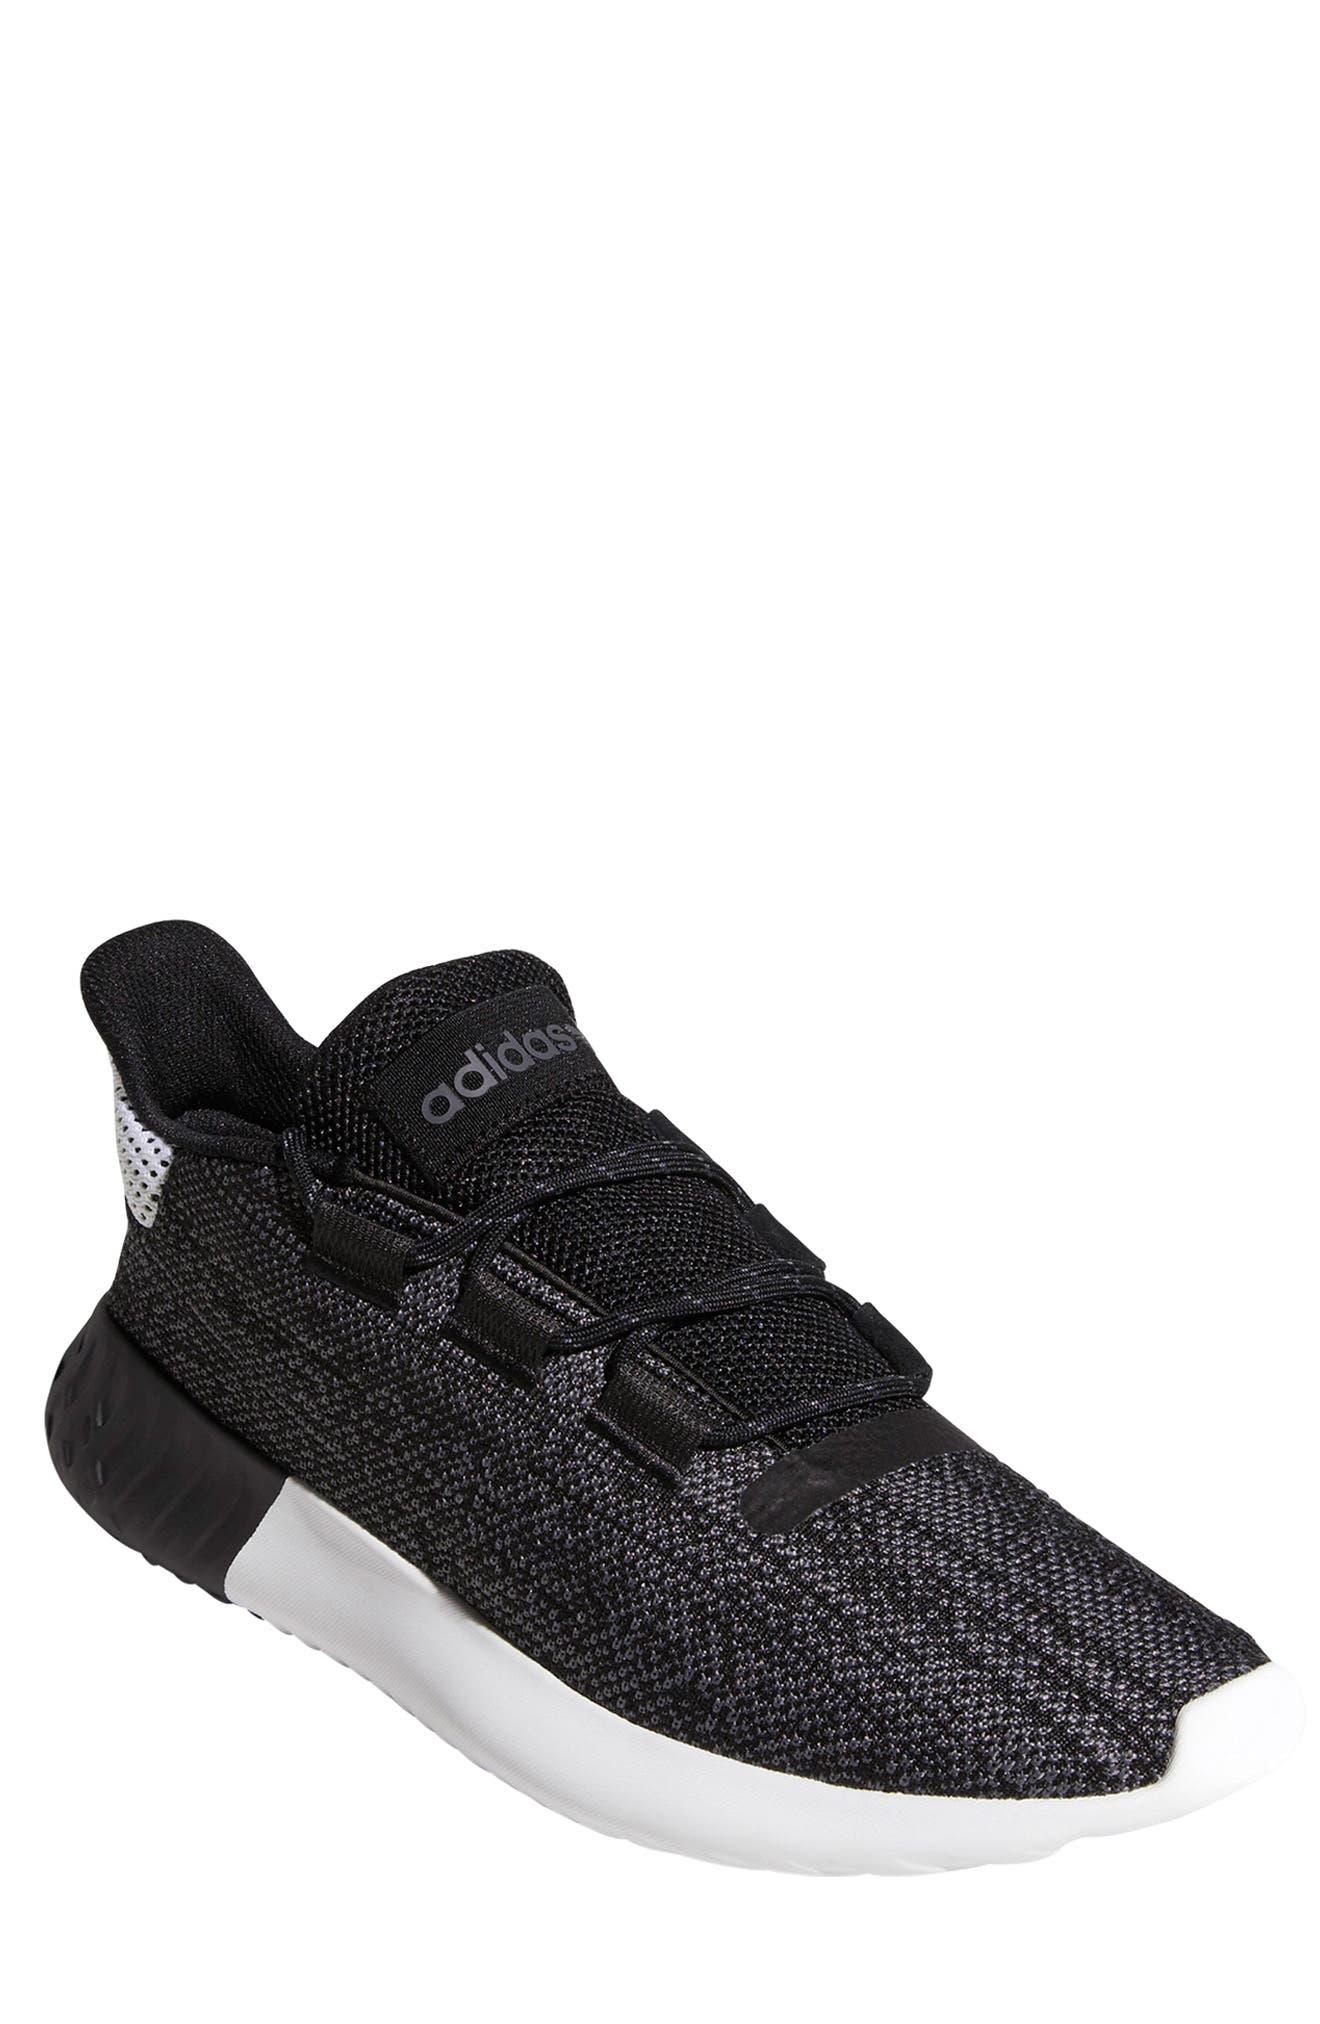 half off bfc6f 89118 ... ireland adidas tubular dusk primeknit sneaker men 47b19 dcc12